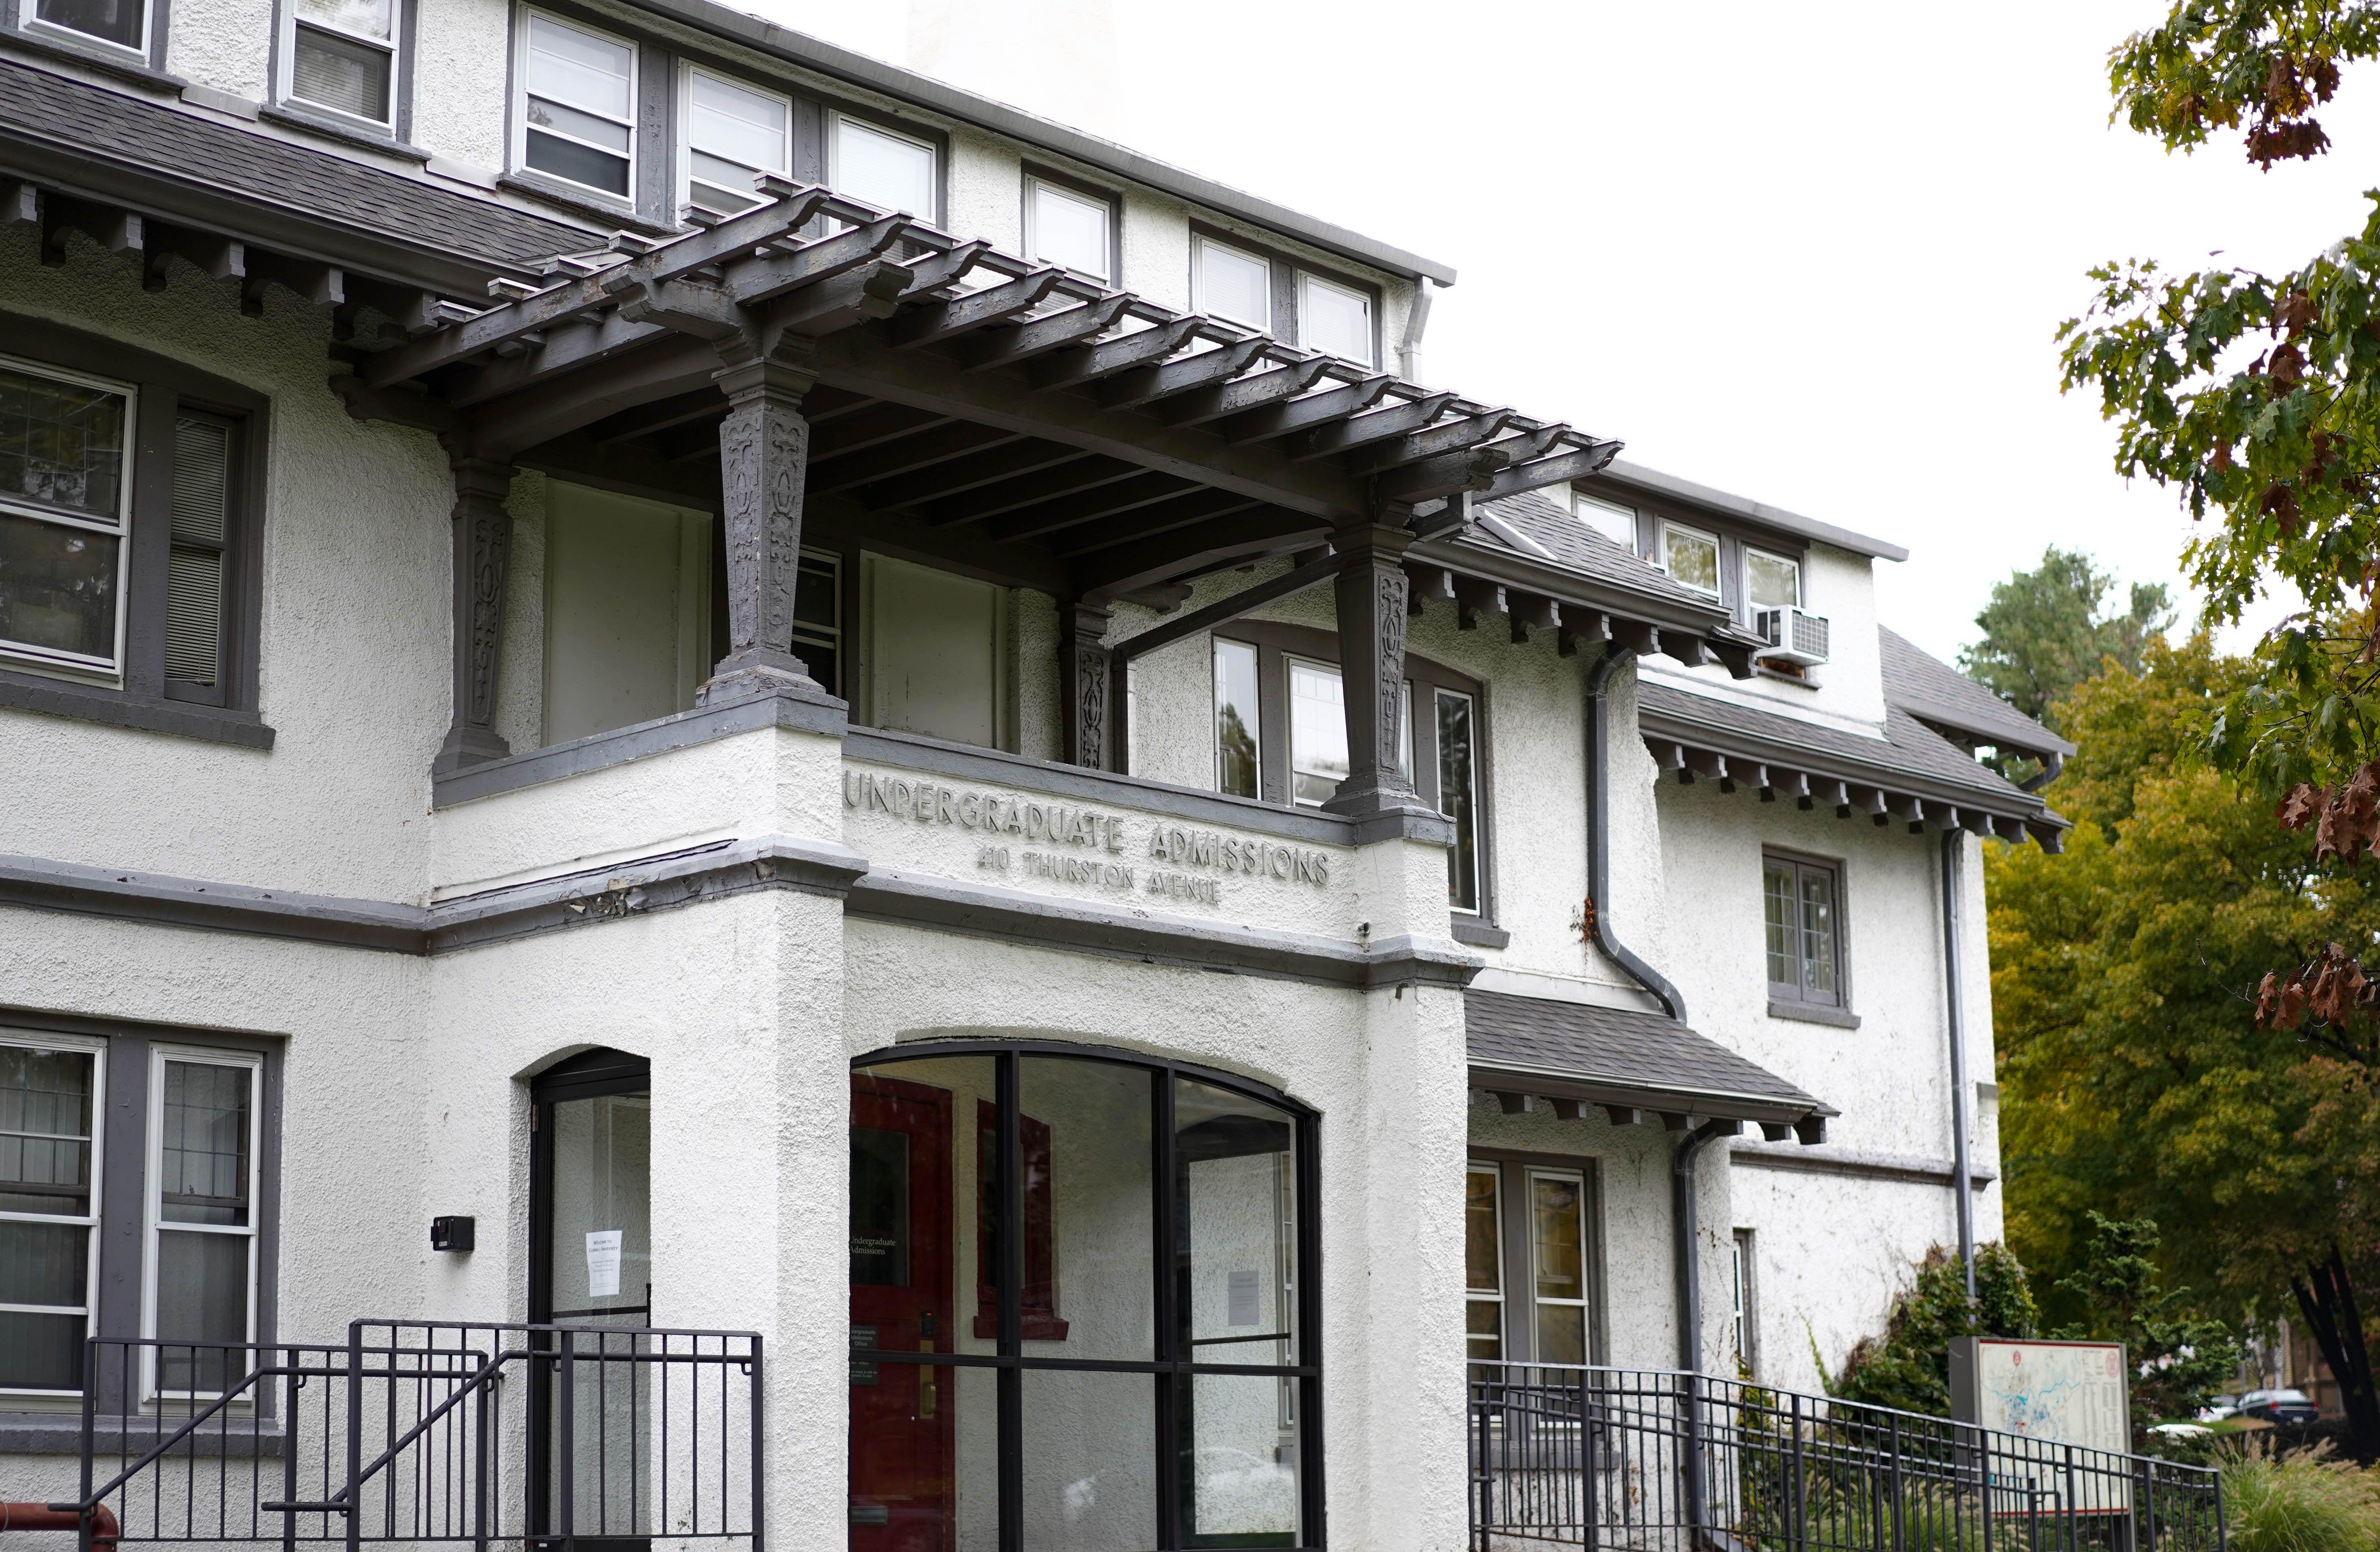 Cornell's undergraduate admissions office at 410 Thurston